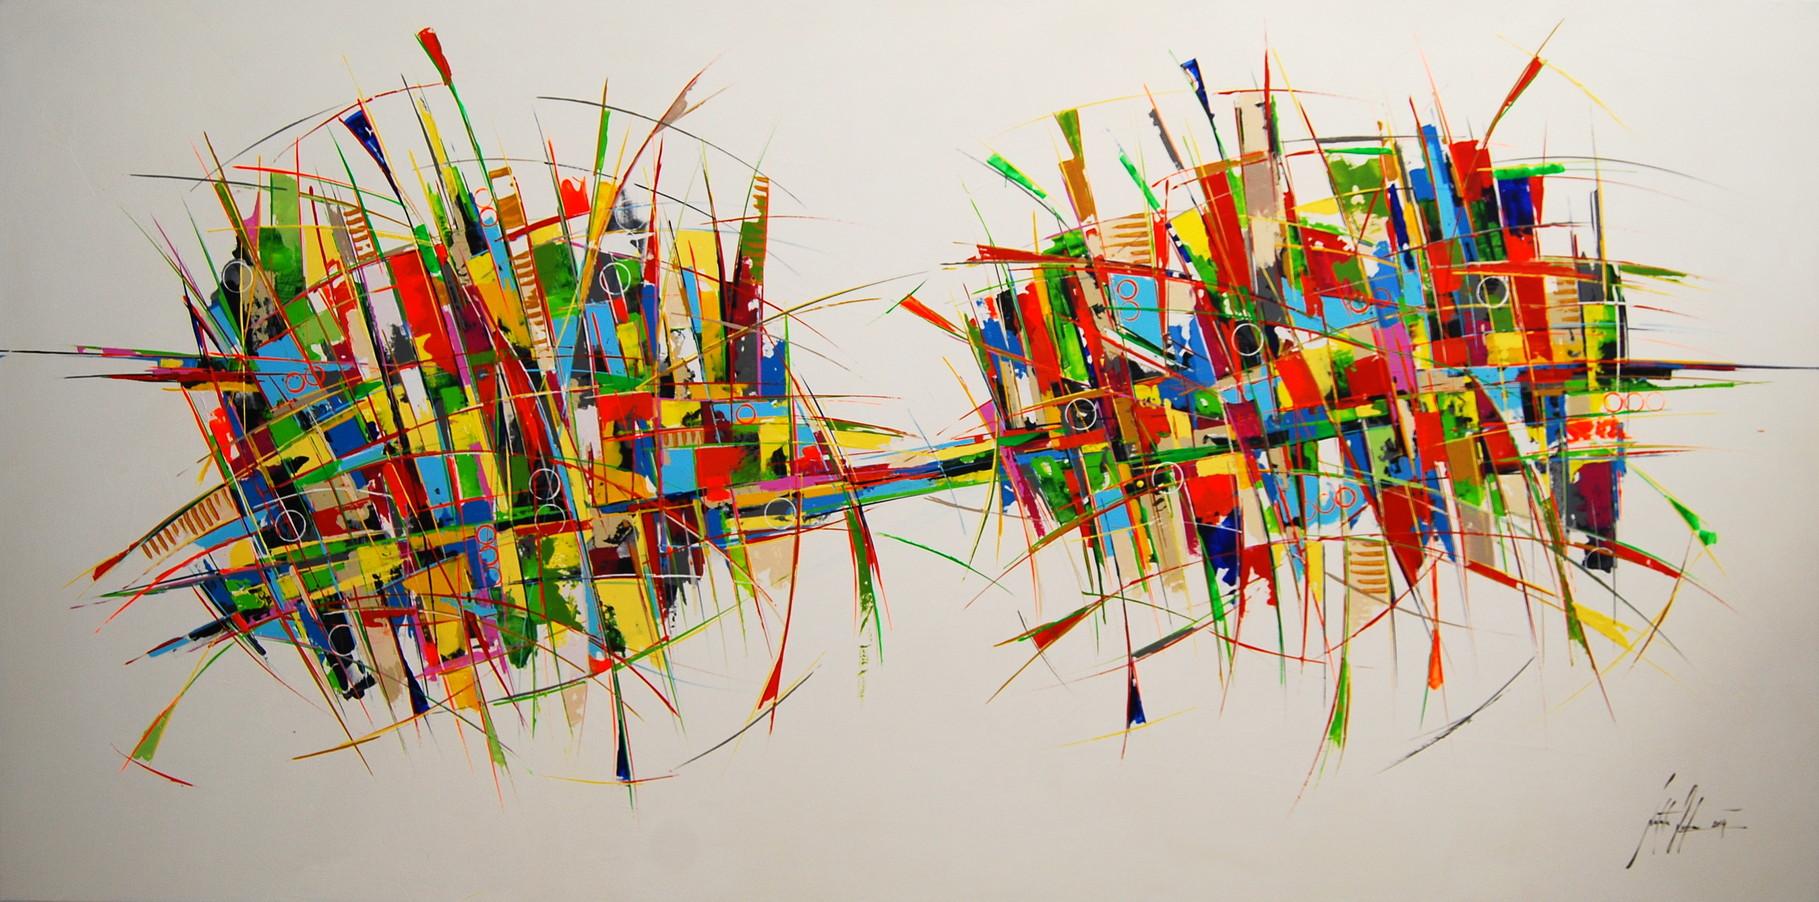 200 x100 cm Acryl auf Leinwand, Galeriekeilrahmen.